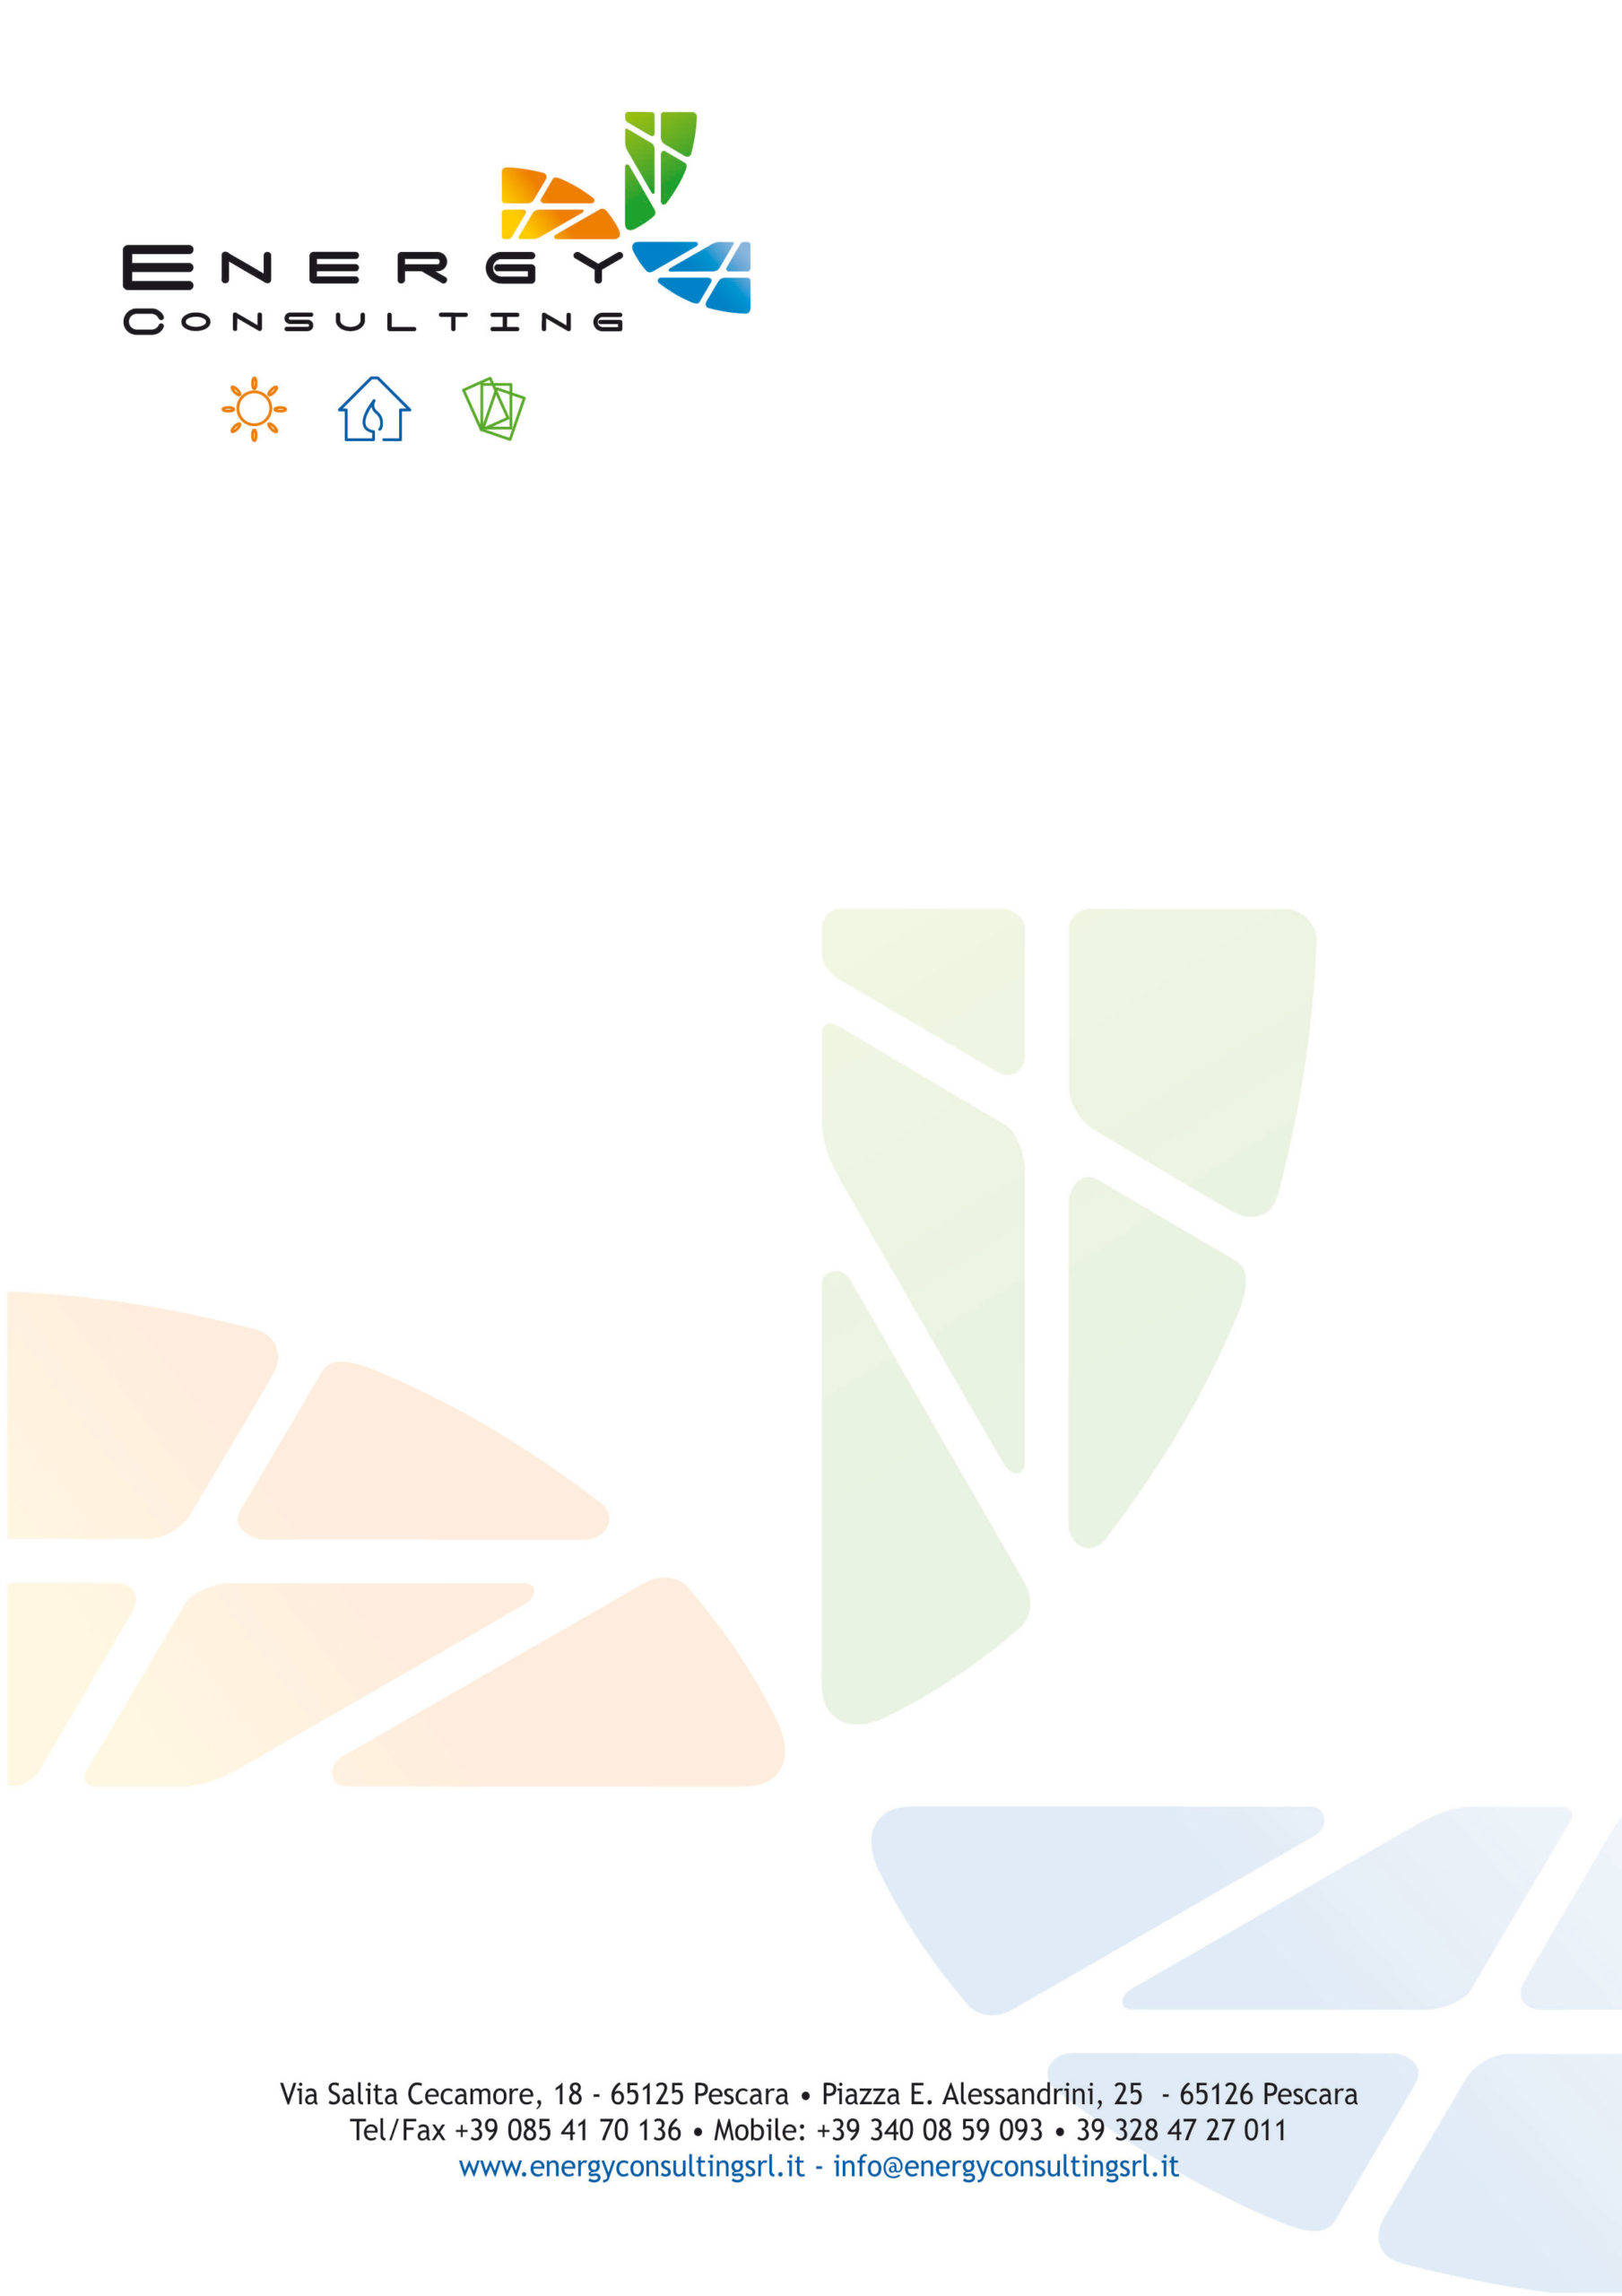 carta intestata energy consulting